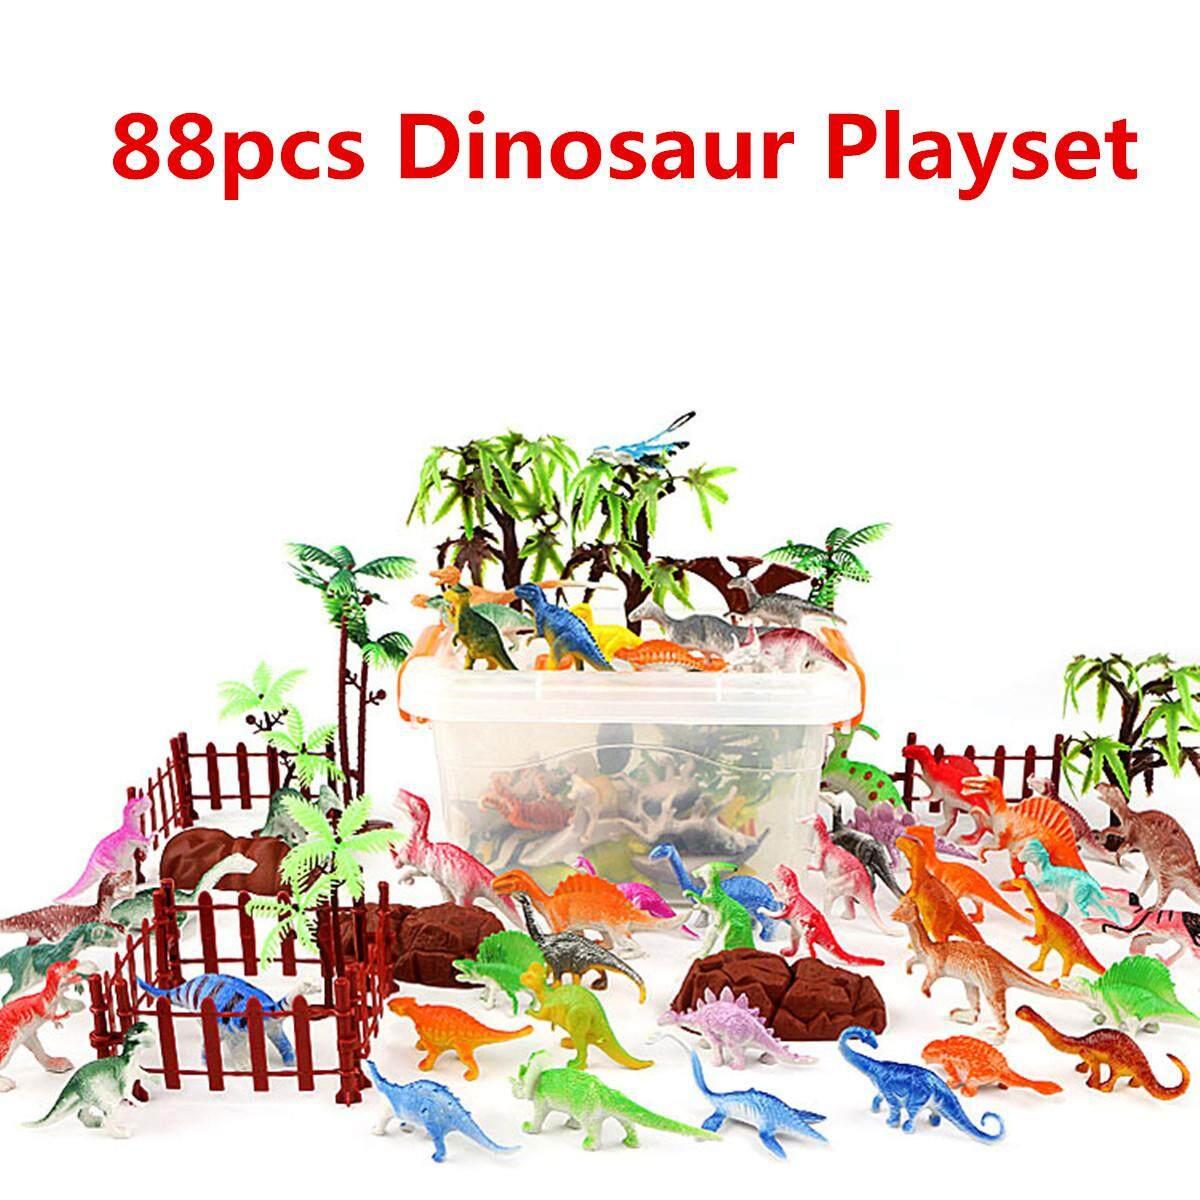 Plastic Farm Yard Wild Fence Tree Animals Model Kids Toys Figures Play Set 88pcs By Glimmer.